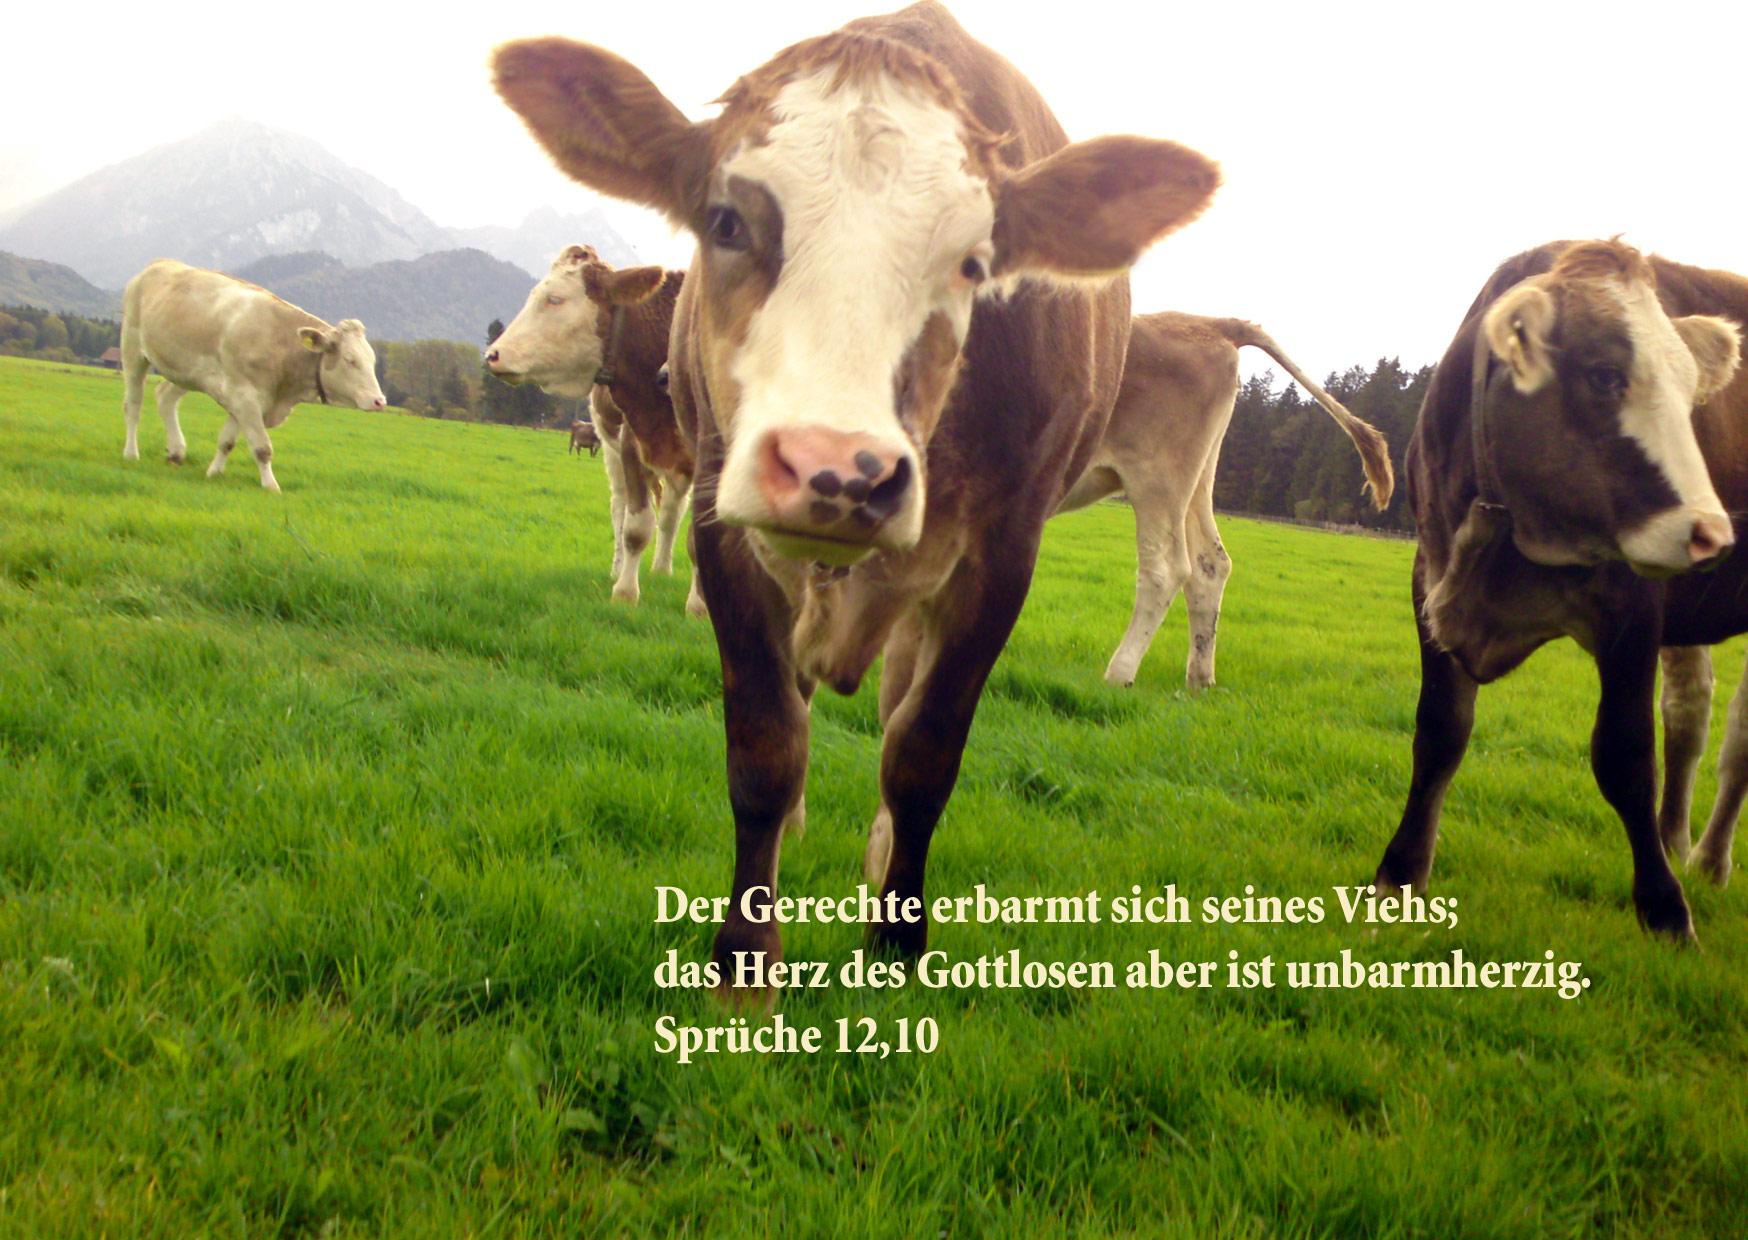 Kühe, Sprüche 12,10, Foto: Christine Danzer go 4 Jesus, Bibel